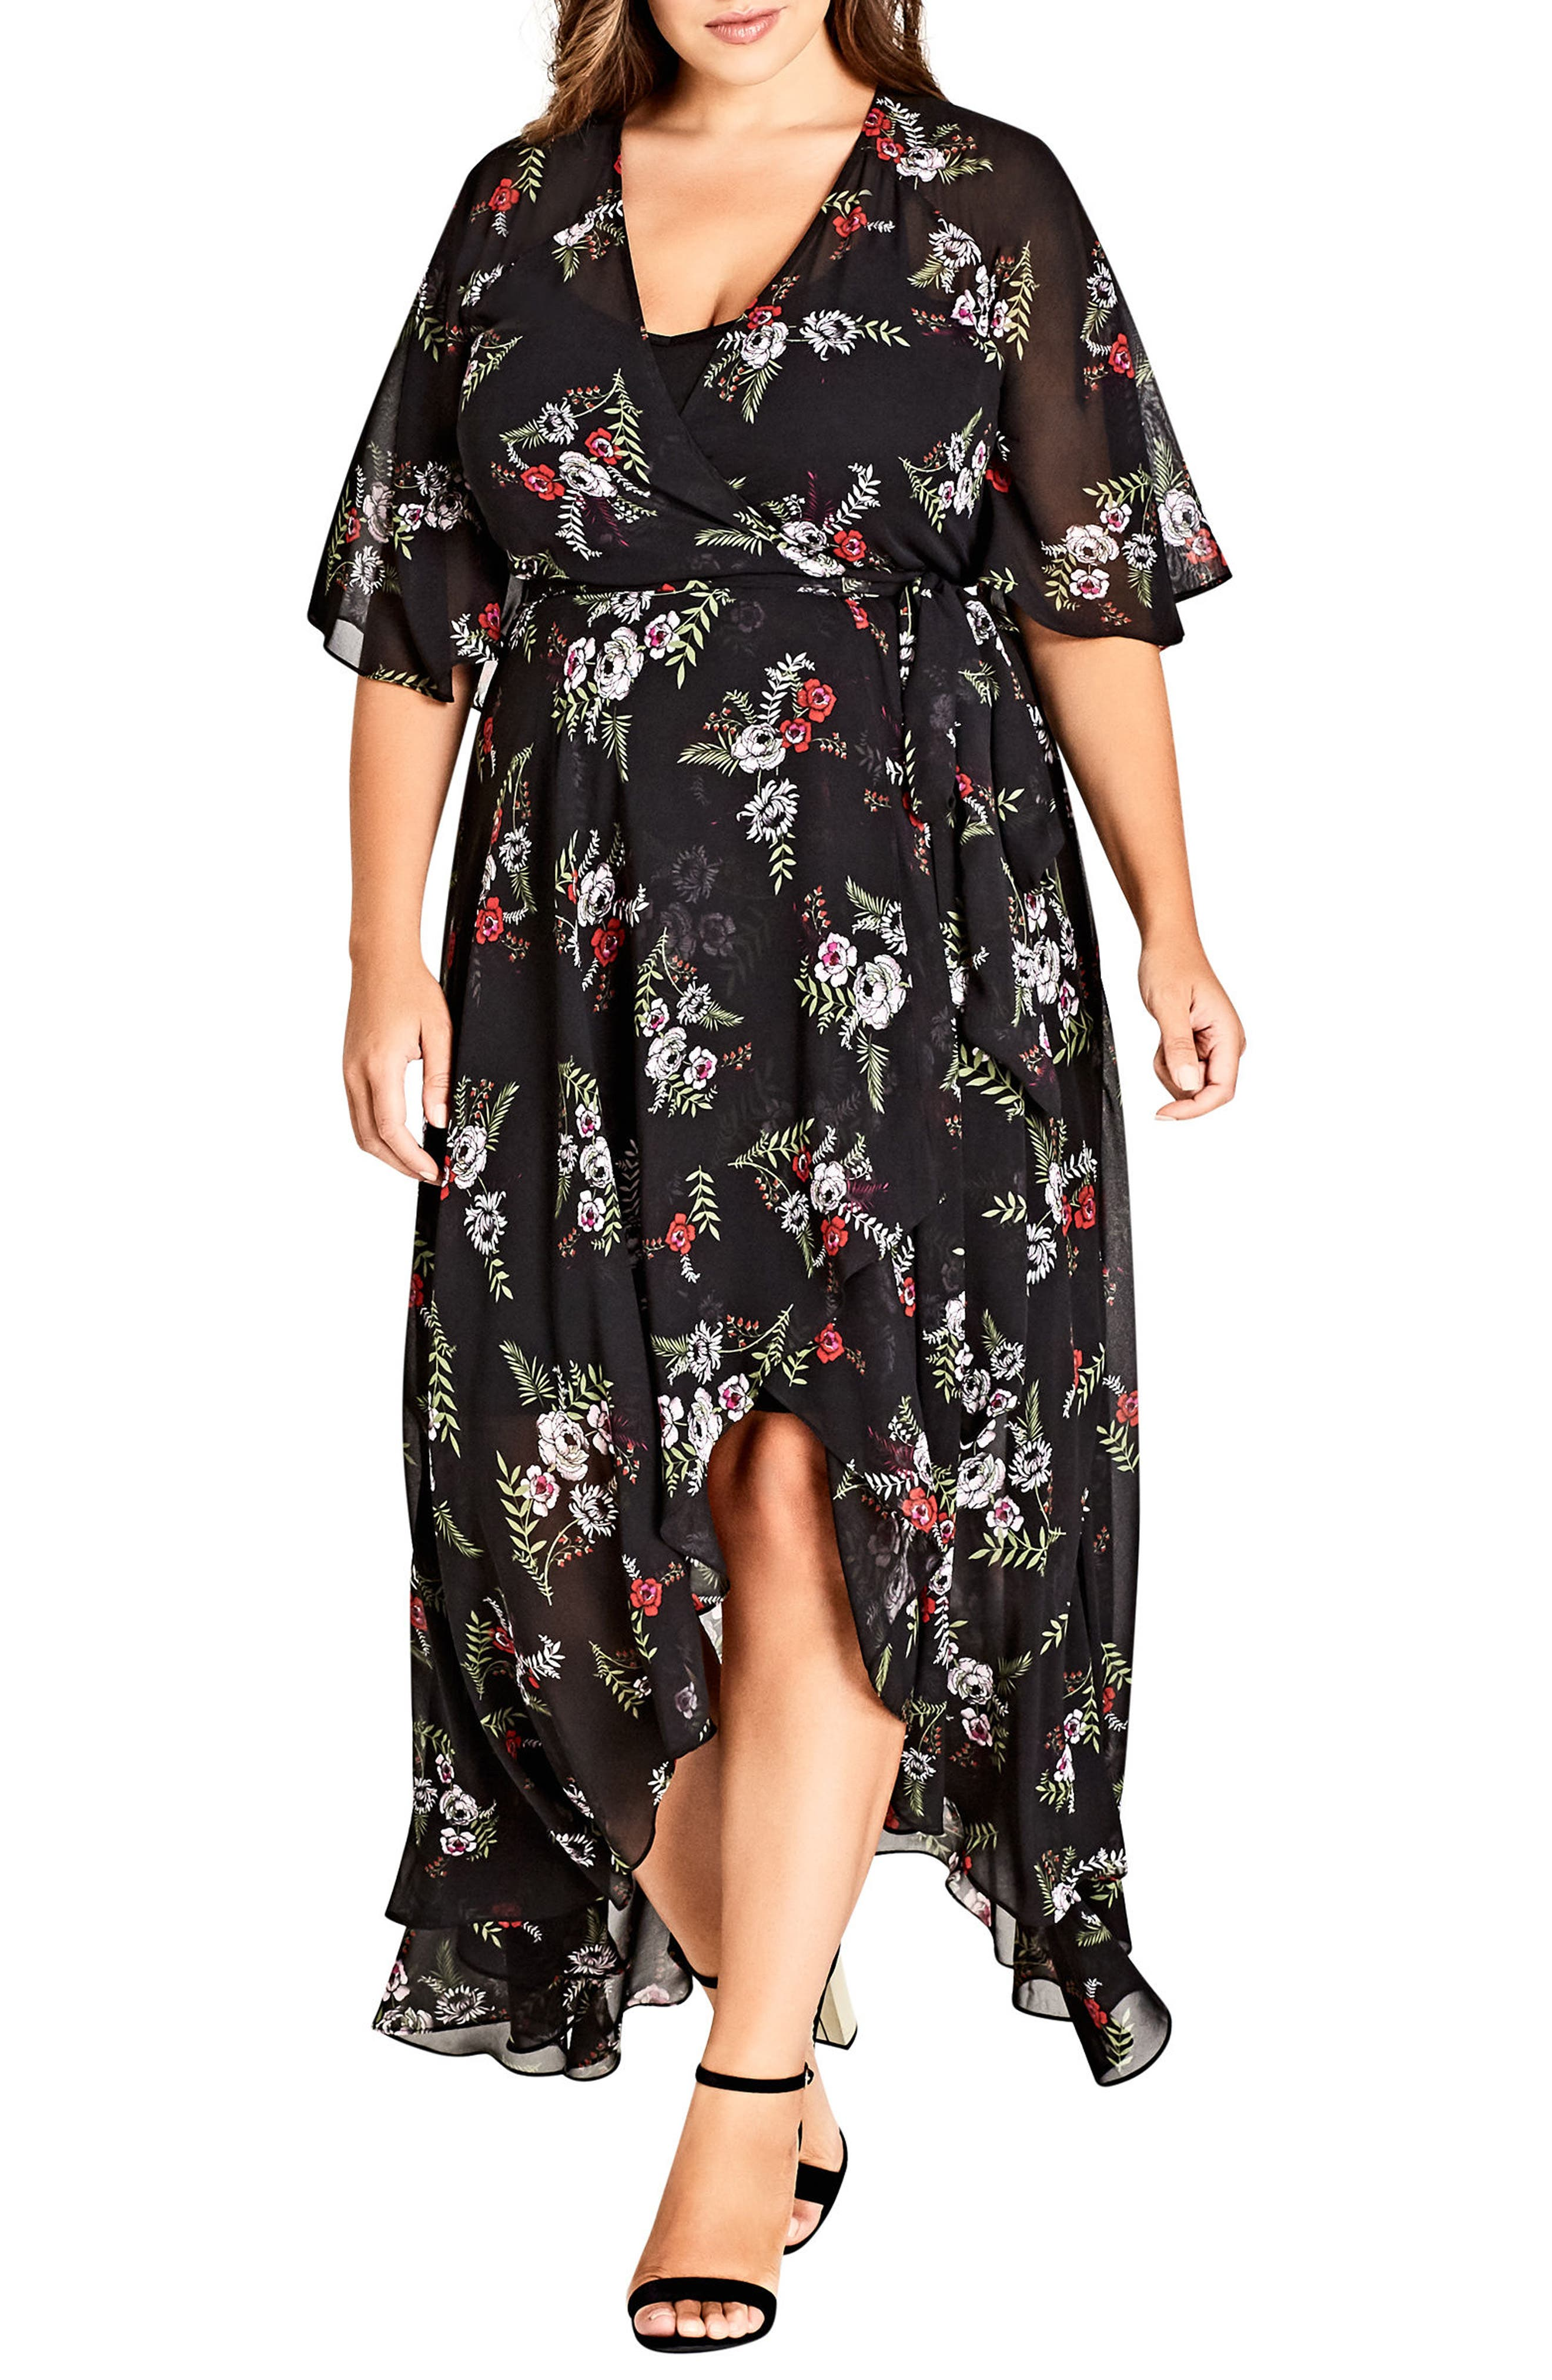 Floral Agave Wrap Dress,                             Main thumbnail 1, color,                             AGAVE FLORAL